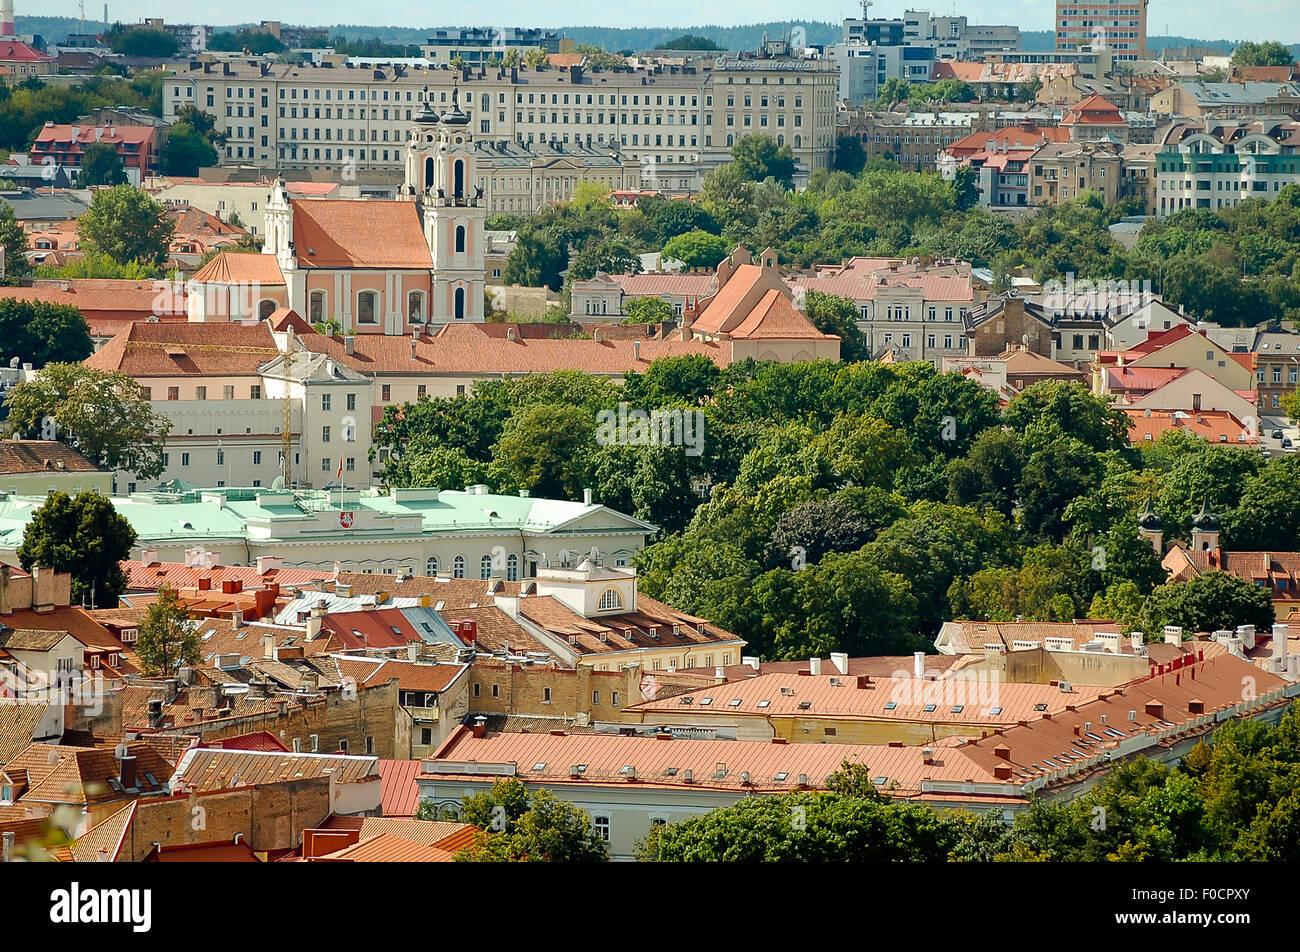 Vilnius - Lithuania - Stock Image